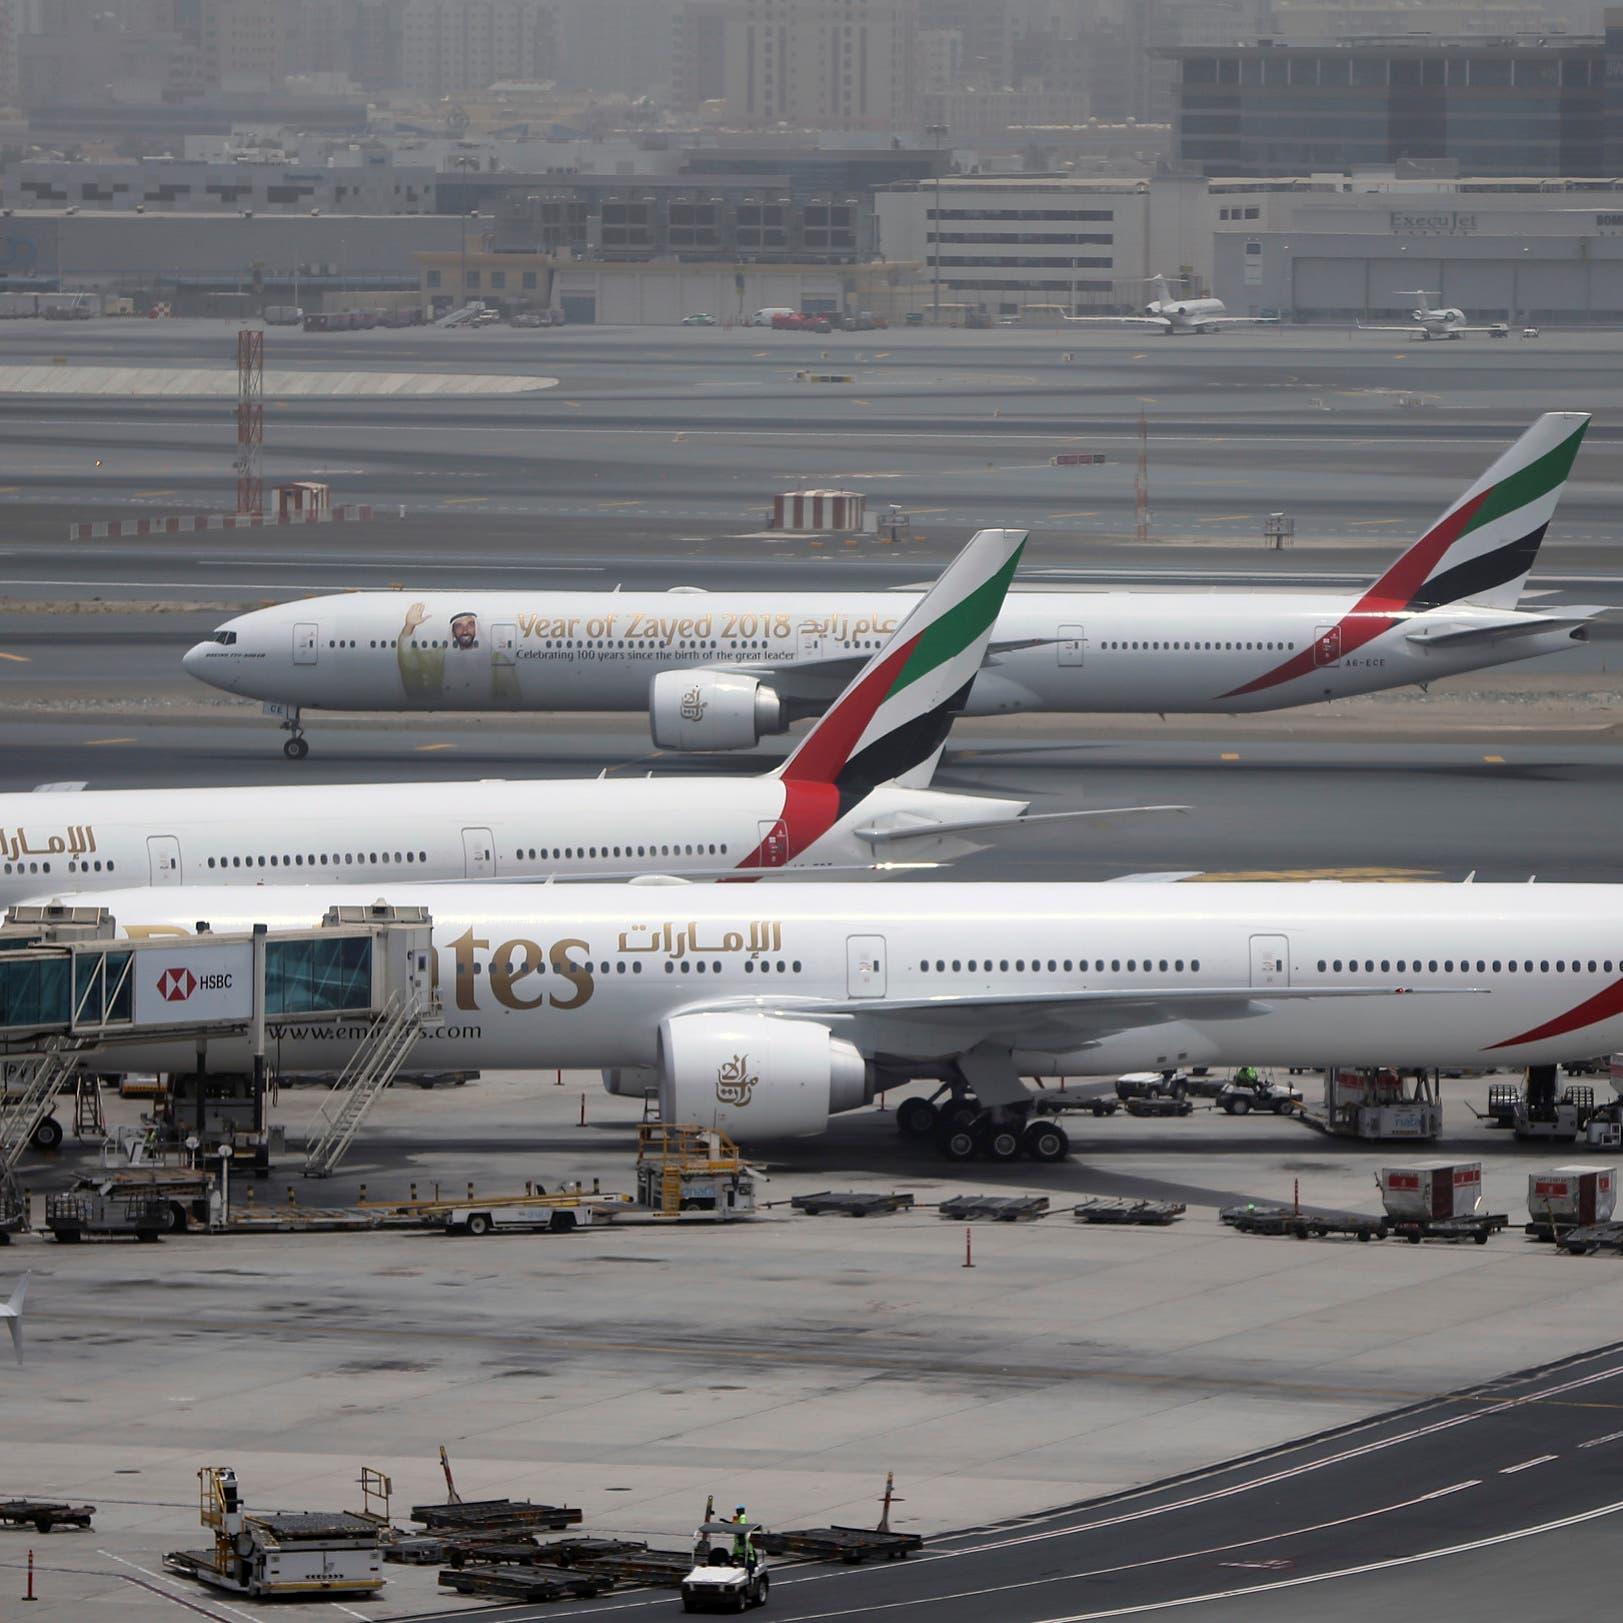 Coronavirus: Emirates airline announces limited passenger flights into Dubai, UAE